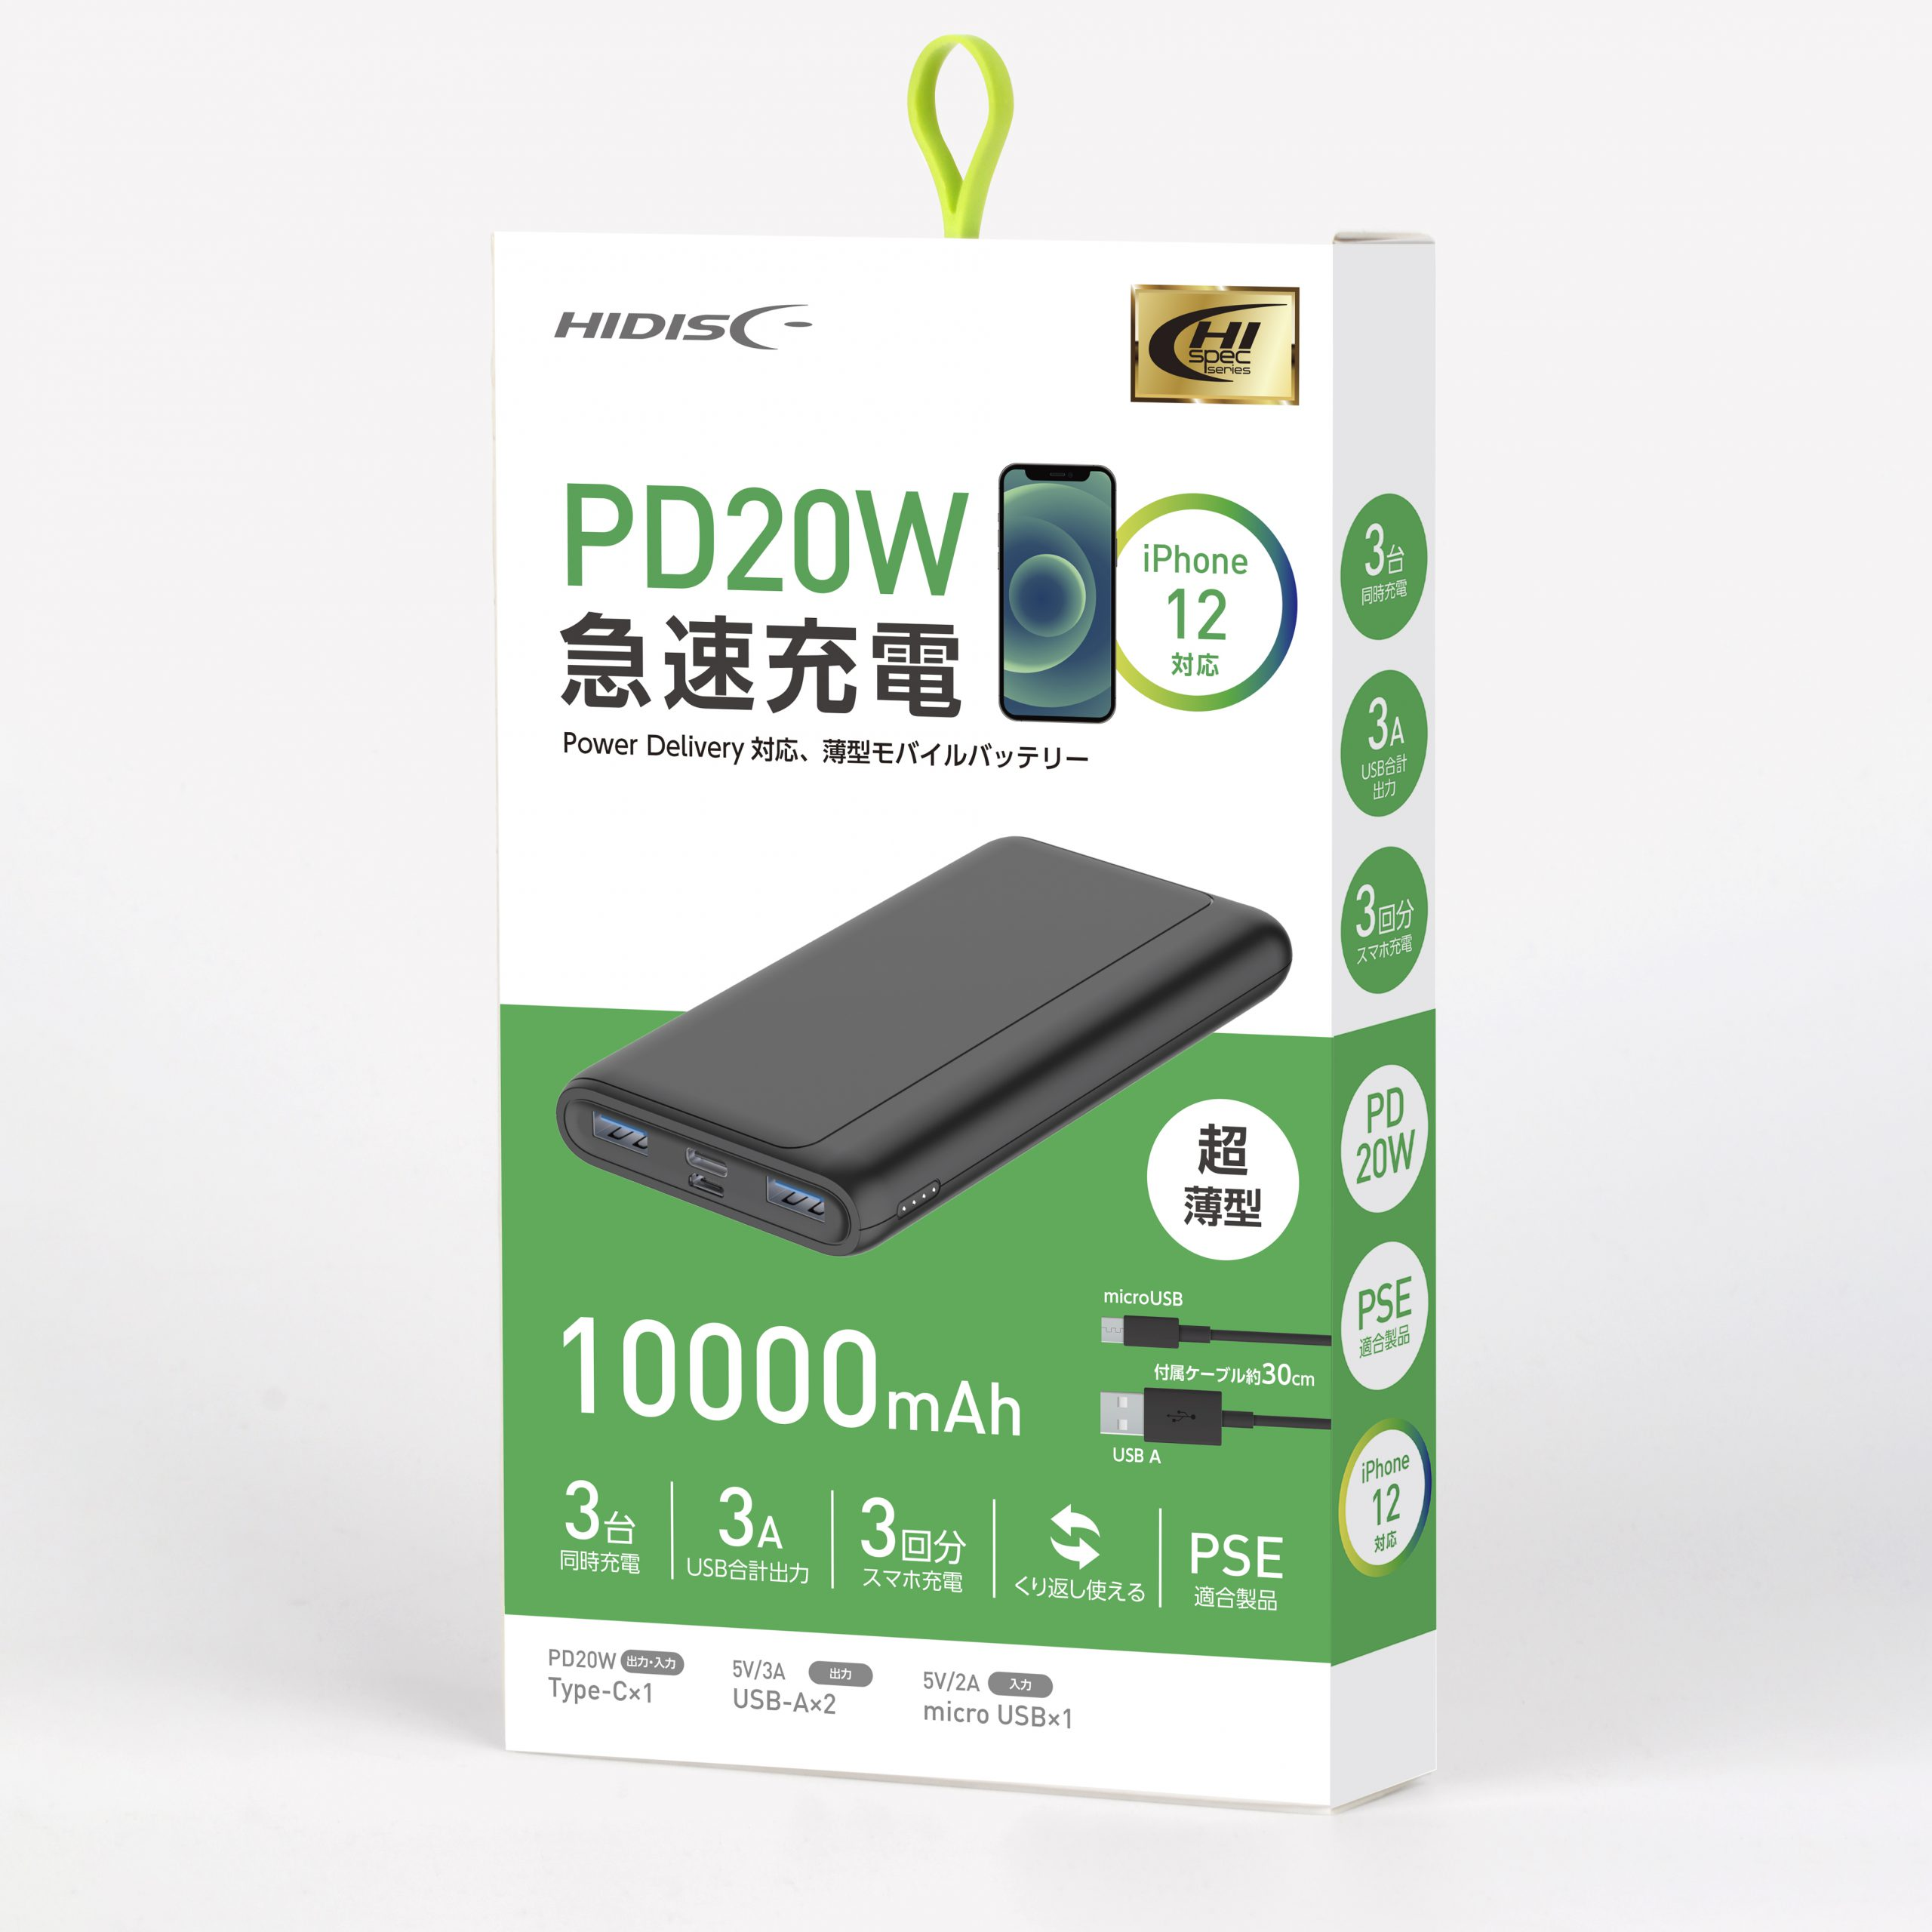 HIDISC PD20W, QC3.0対応 10000mAhモバイルバッテリーブラック HD-PD20W10000BTBK